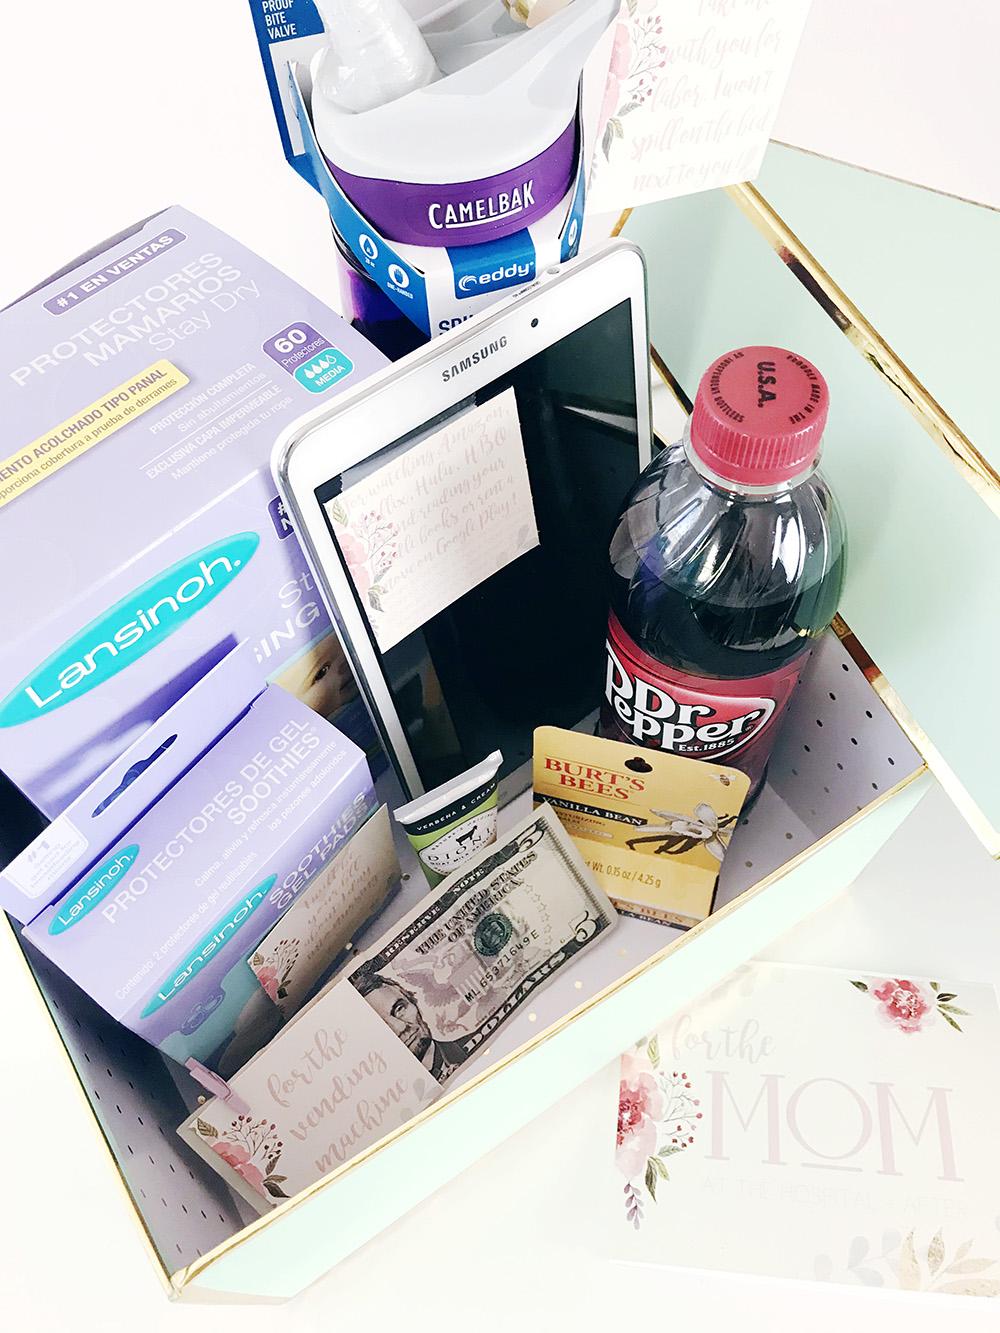 Hospital essentials for mom diy baby shower gift a joyful riot hospital essentials for mom baby shower gift t negle Images